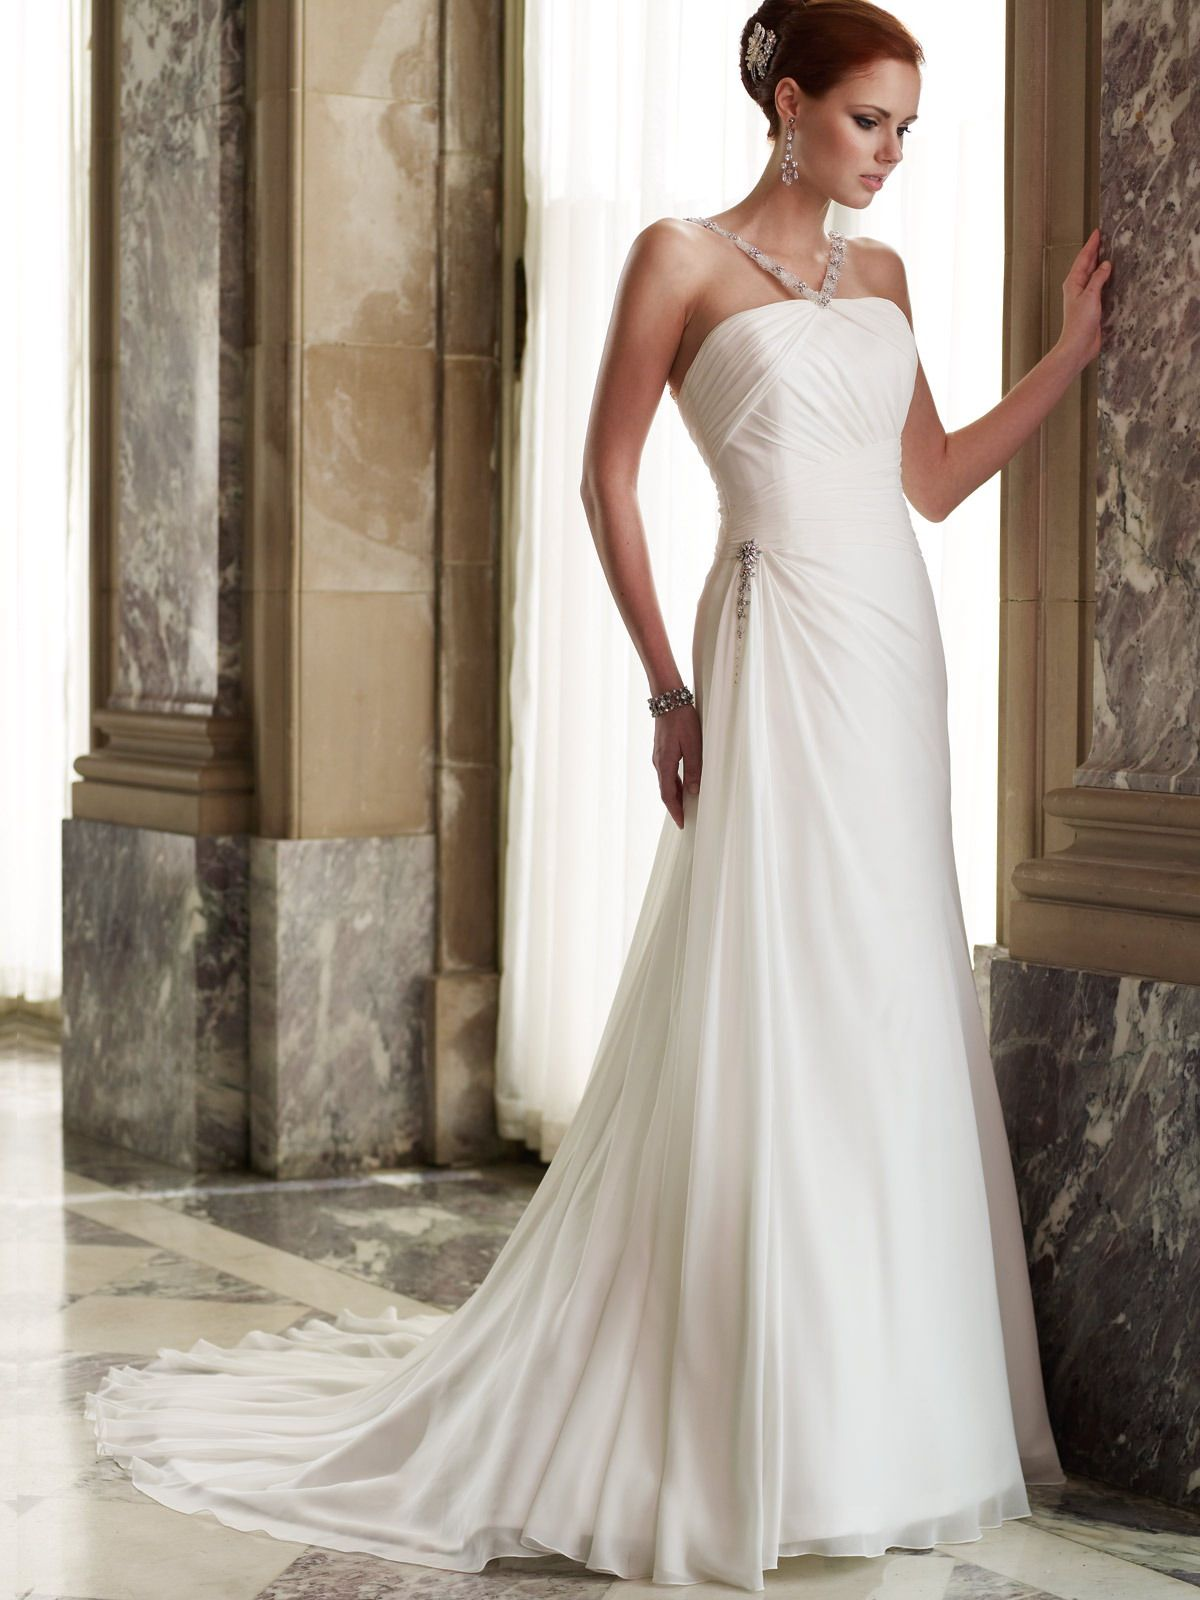 Simple wedding dresses cheap  Mon Cheri Bridal Gown Style  Drea  Wedding Dress  Pinterest